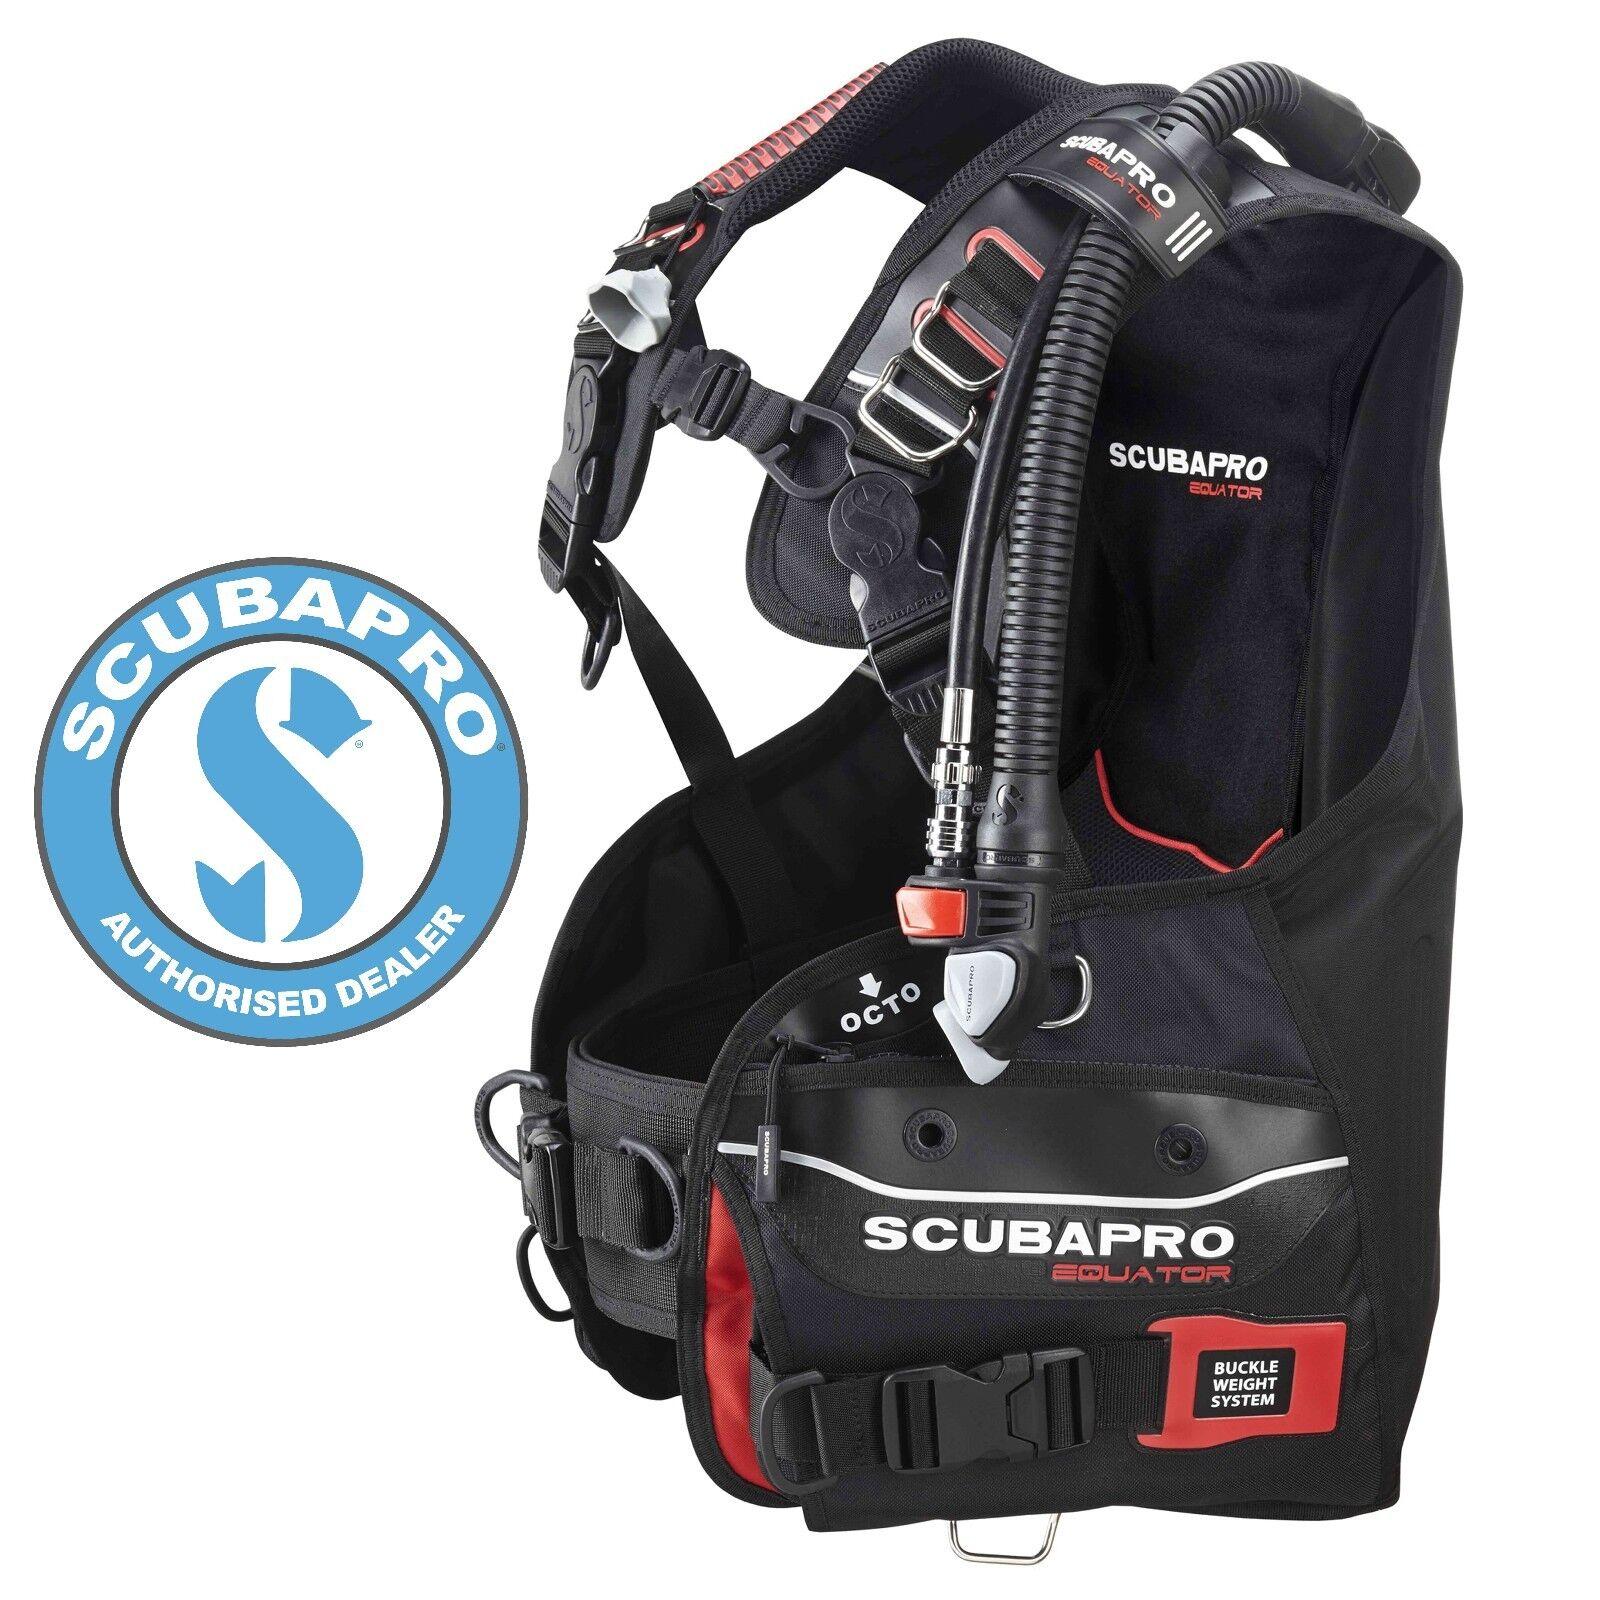 Scubapro BCD Equator  Free Shipping